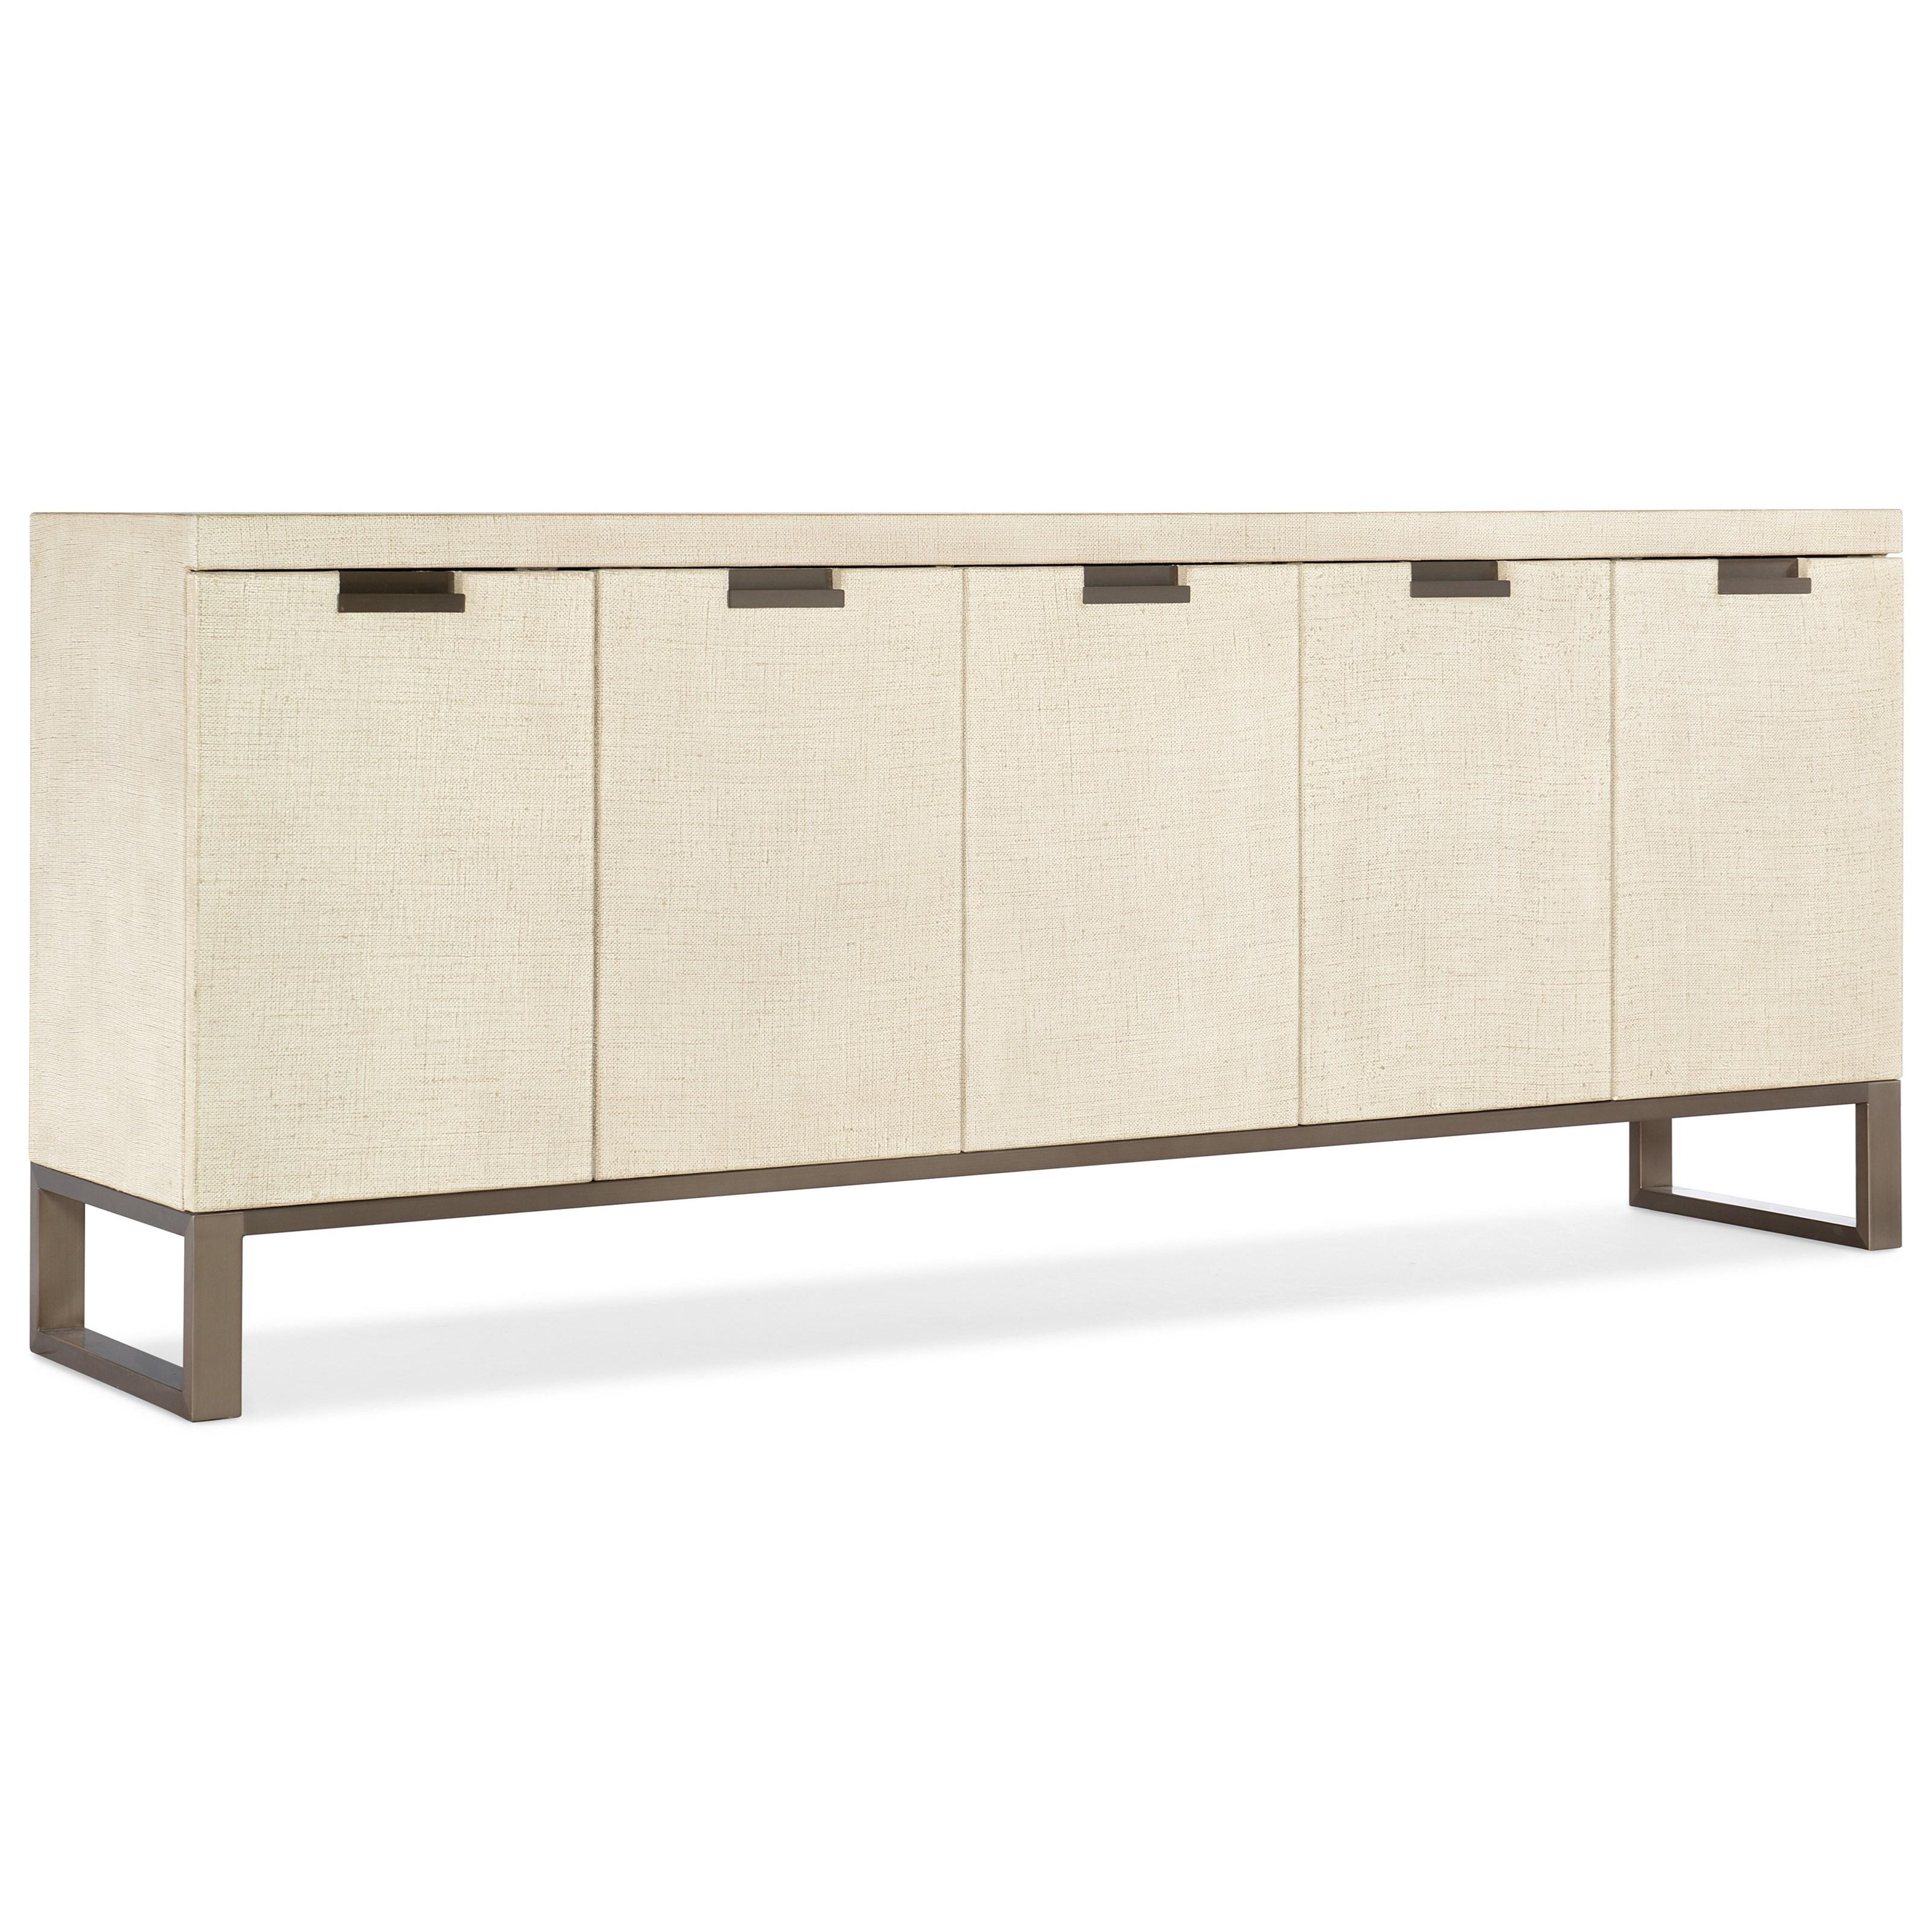 Cascade Server by Hooker Furniture at Stoney Creek Furniture